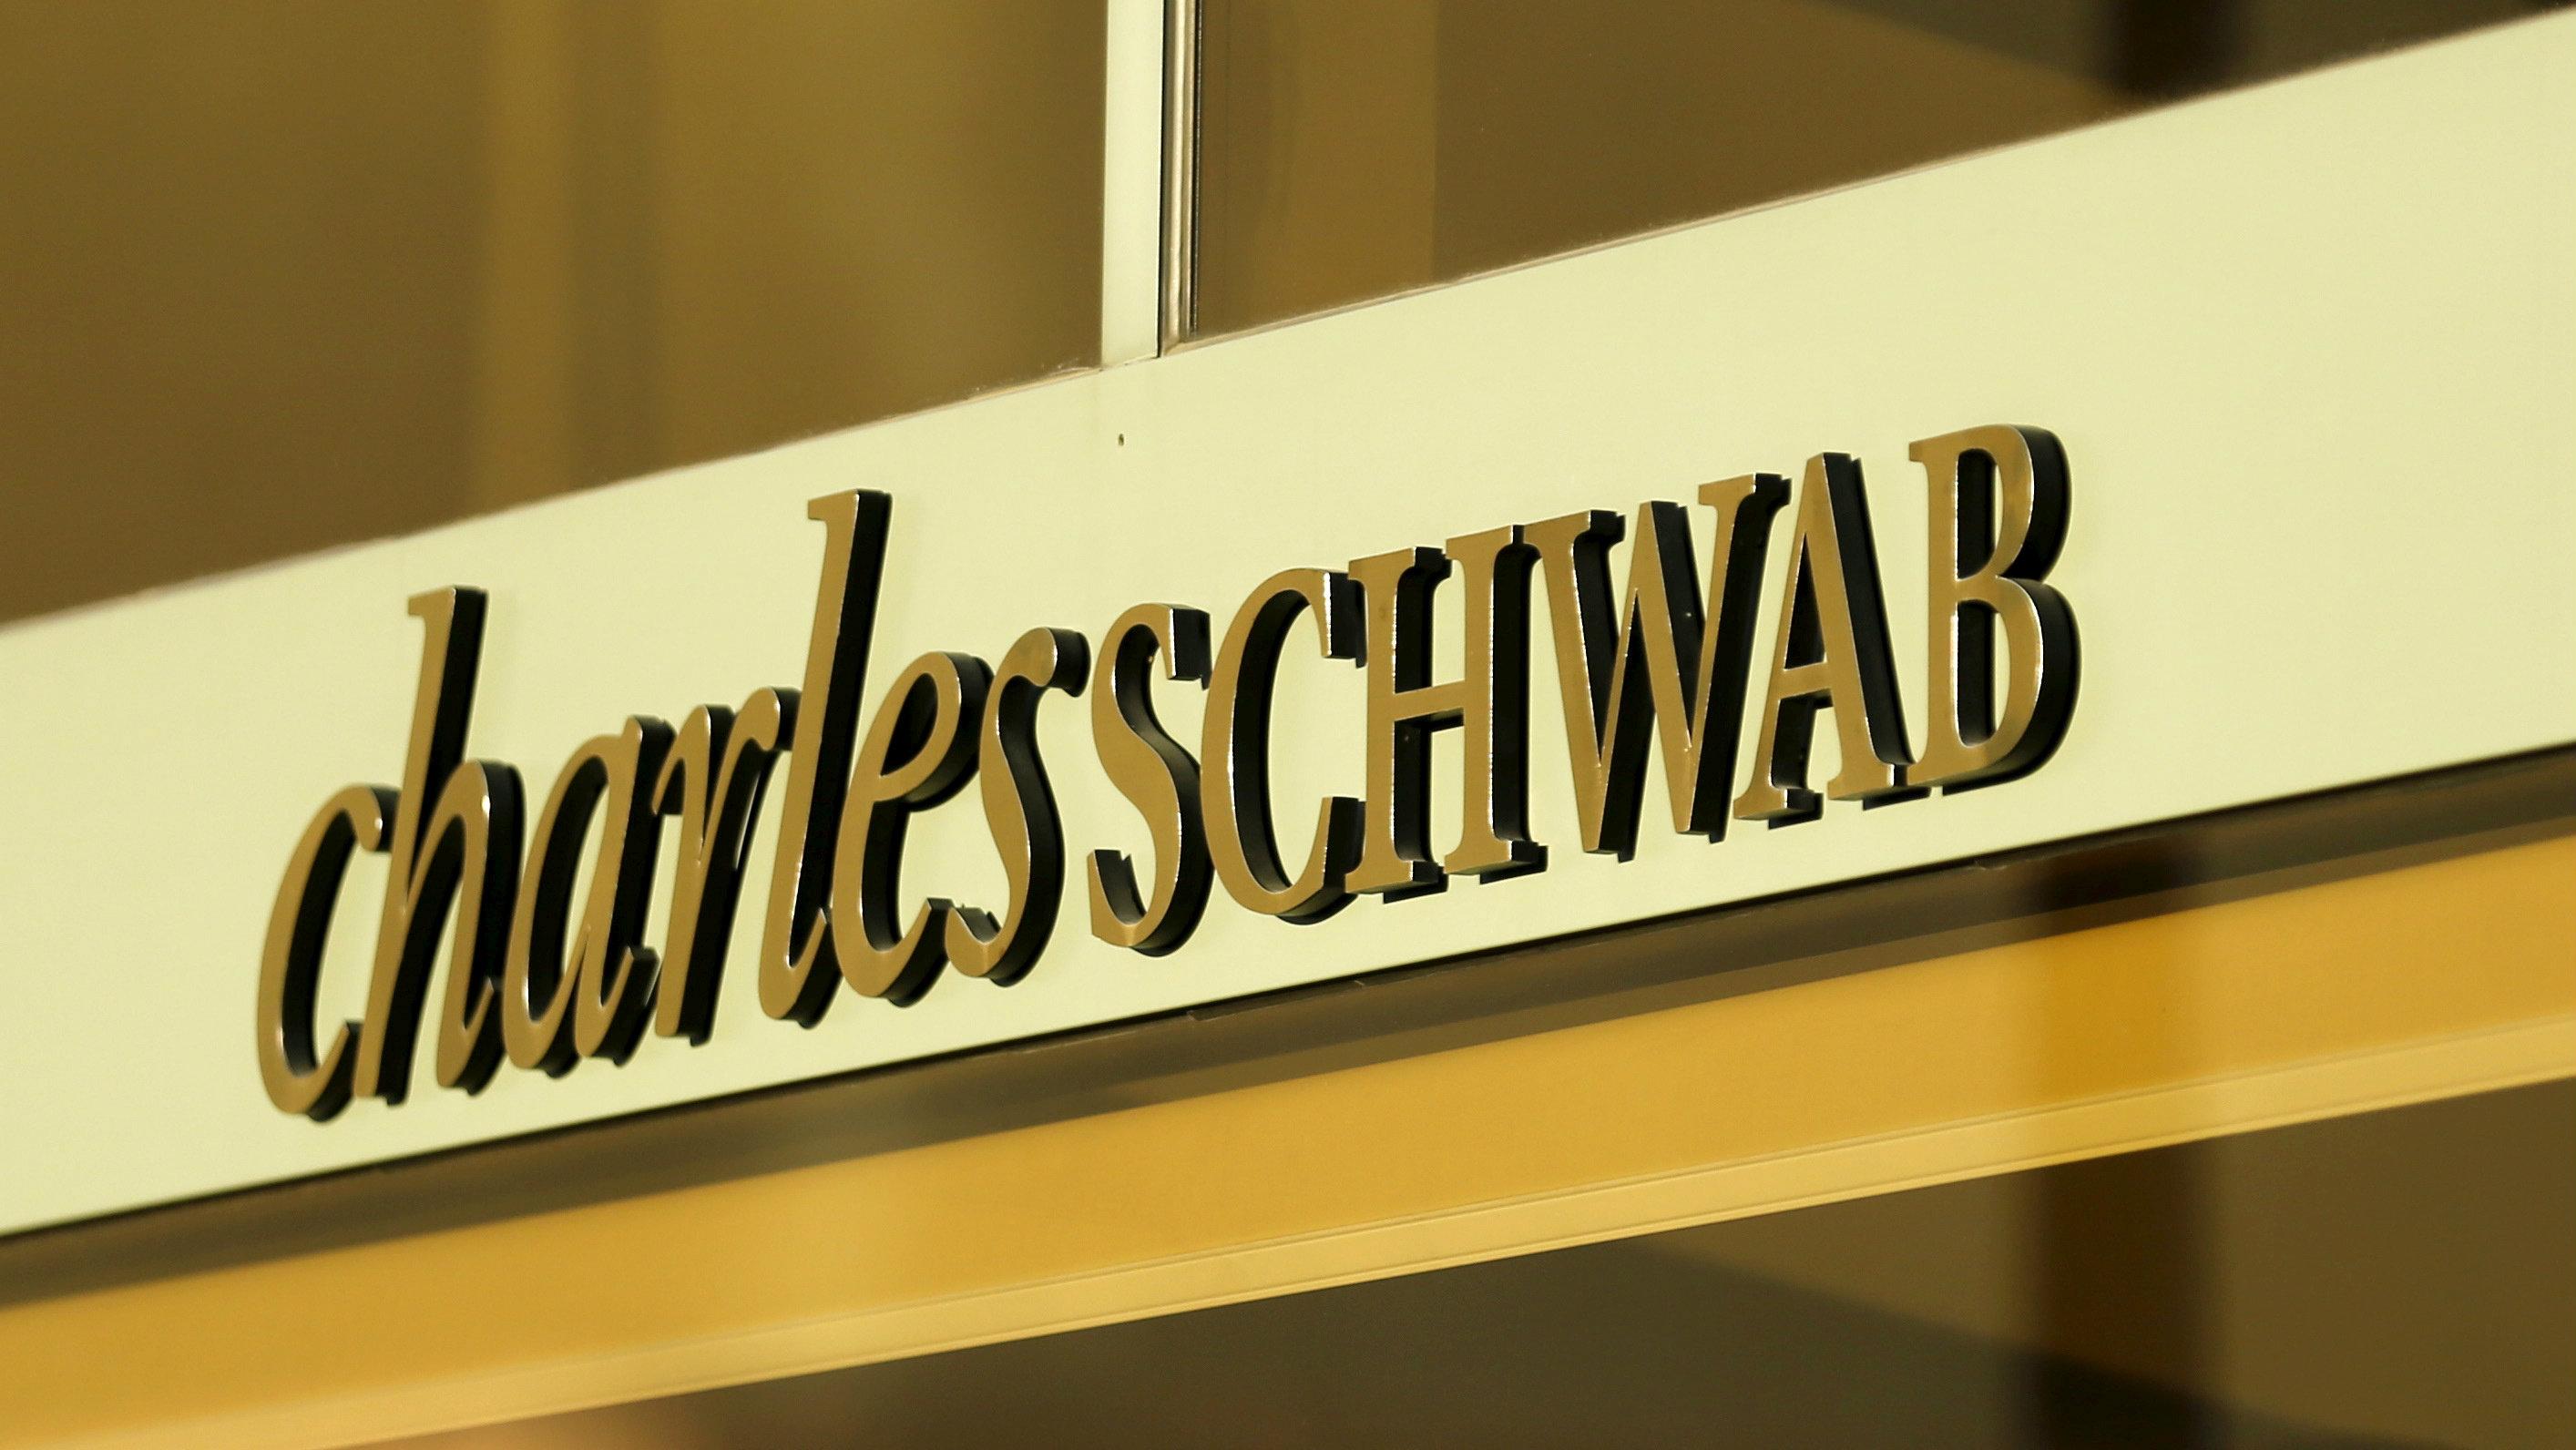 A Charles Schwab sign